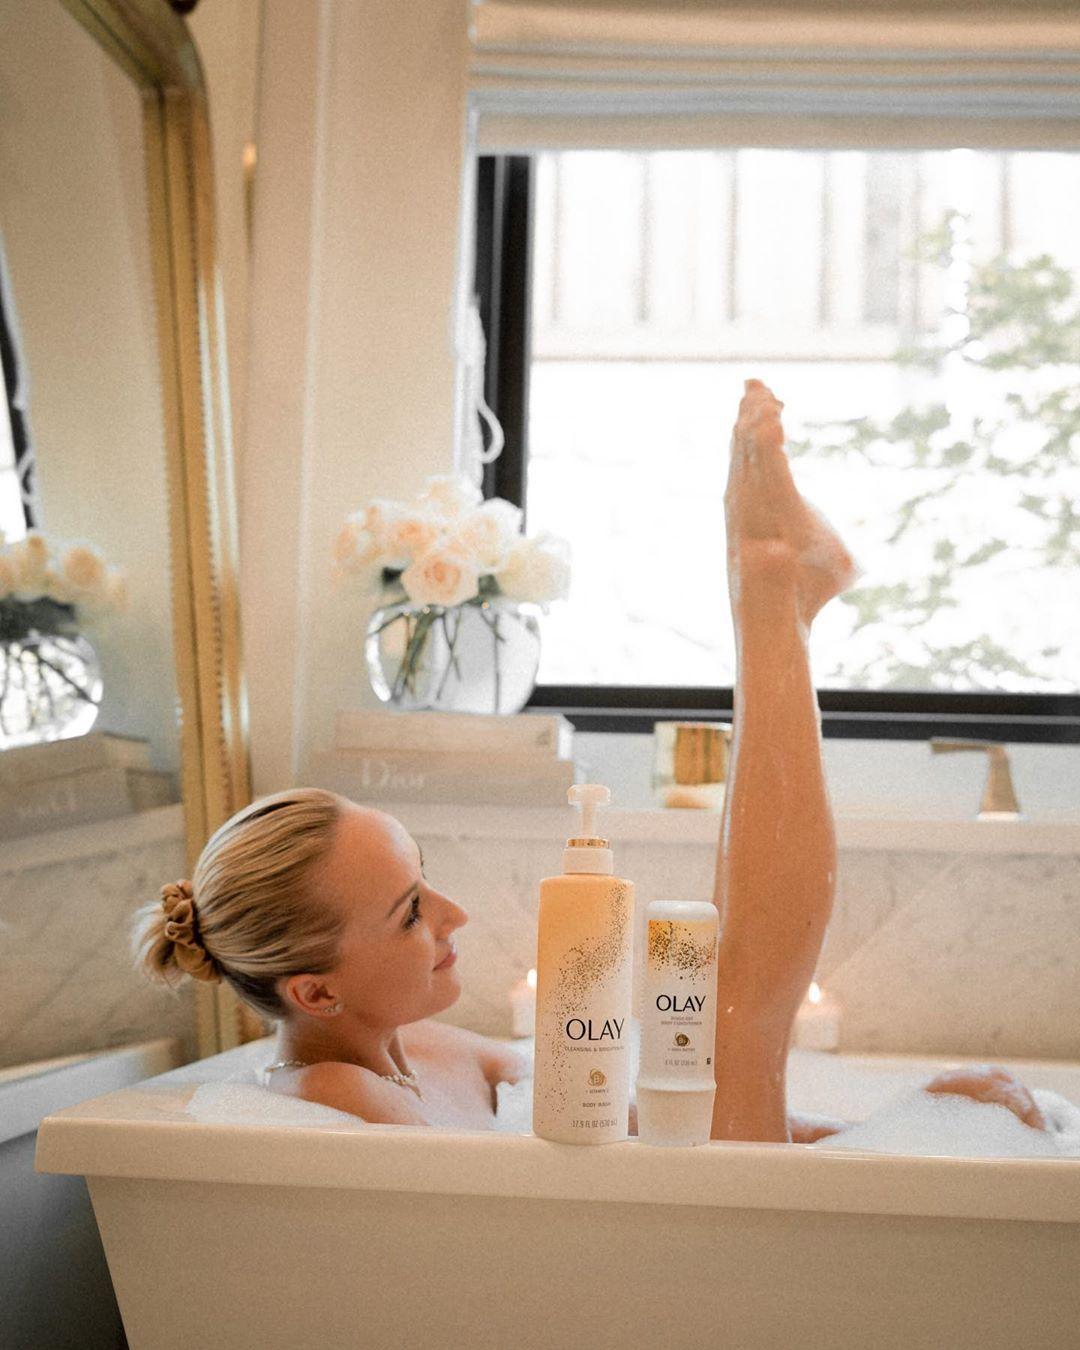 Nastia Liukin in a bath